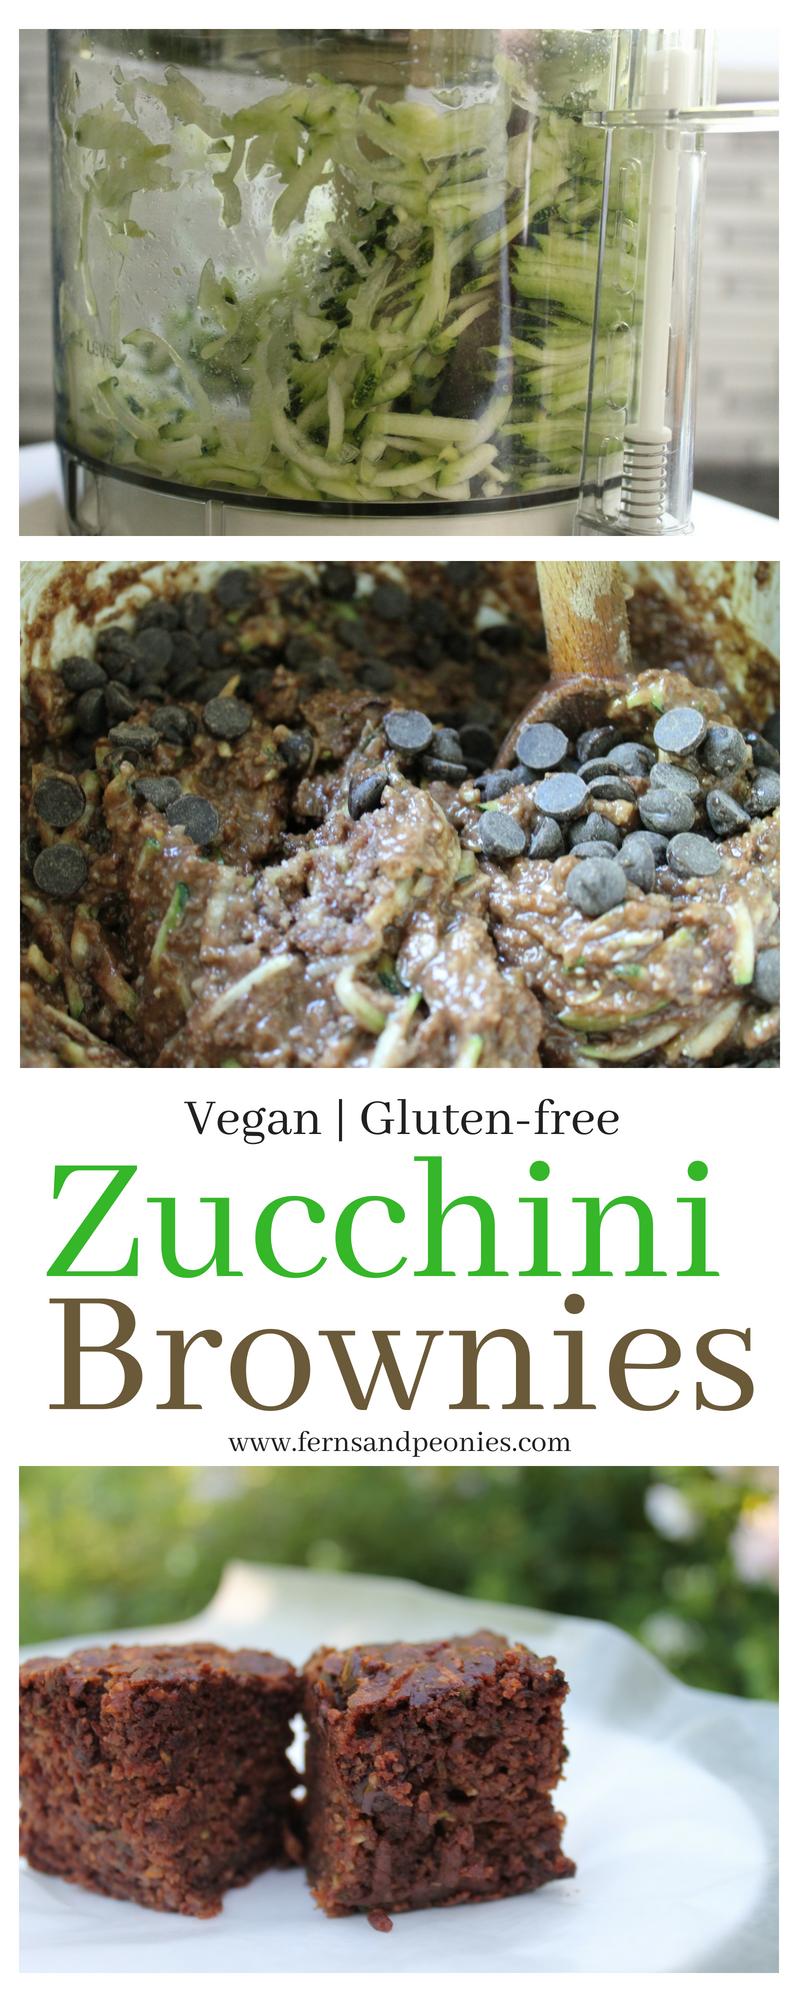 Moist and cake-like vegan and gluten-free Zucchini Brownies from www.fernsandpeonies.com